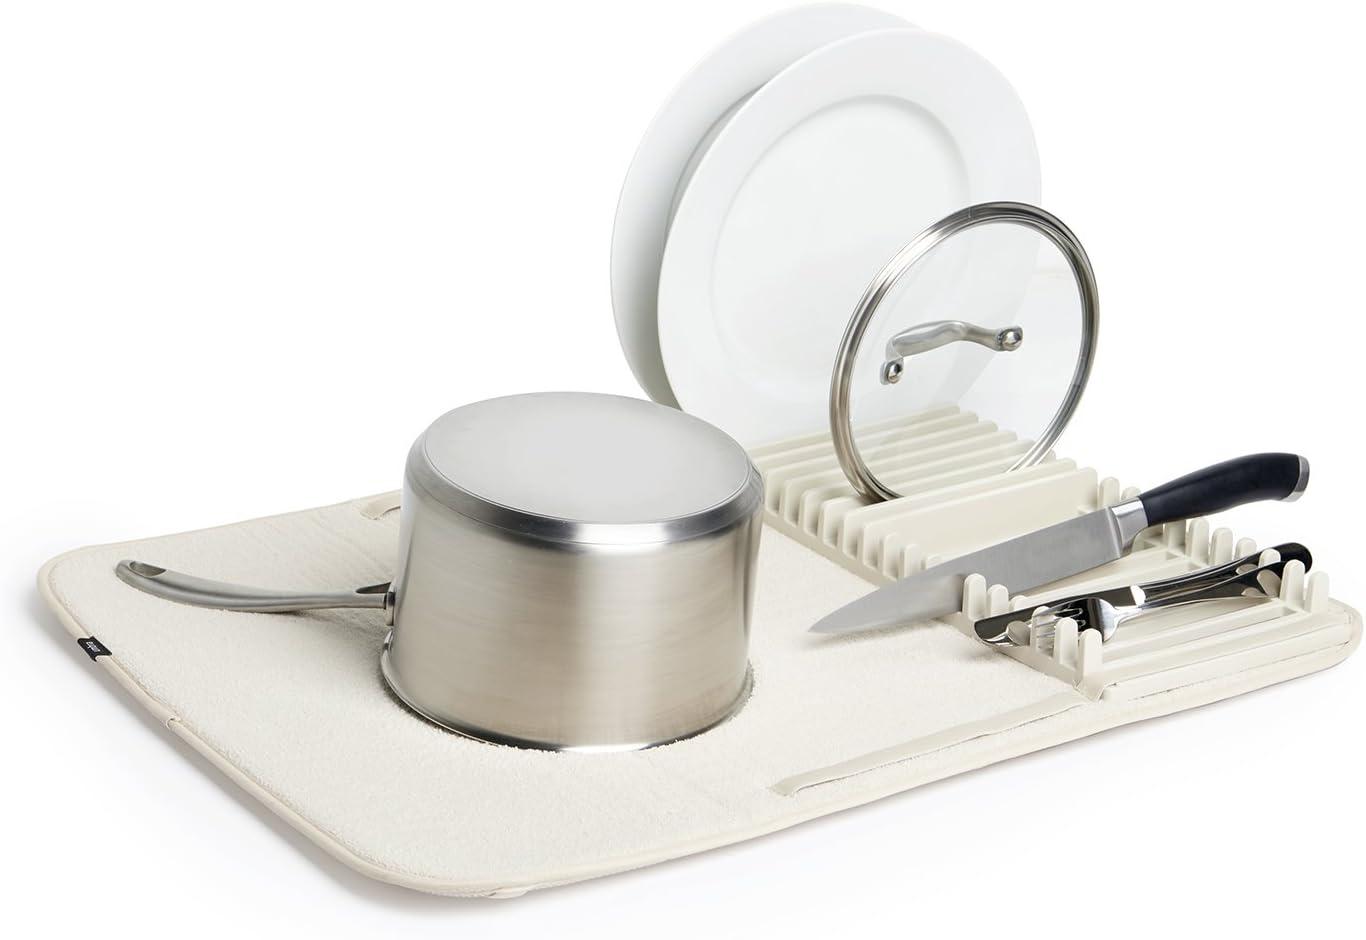 Umbra UDry Dish Drying Rack, 24 x 18, Linen